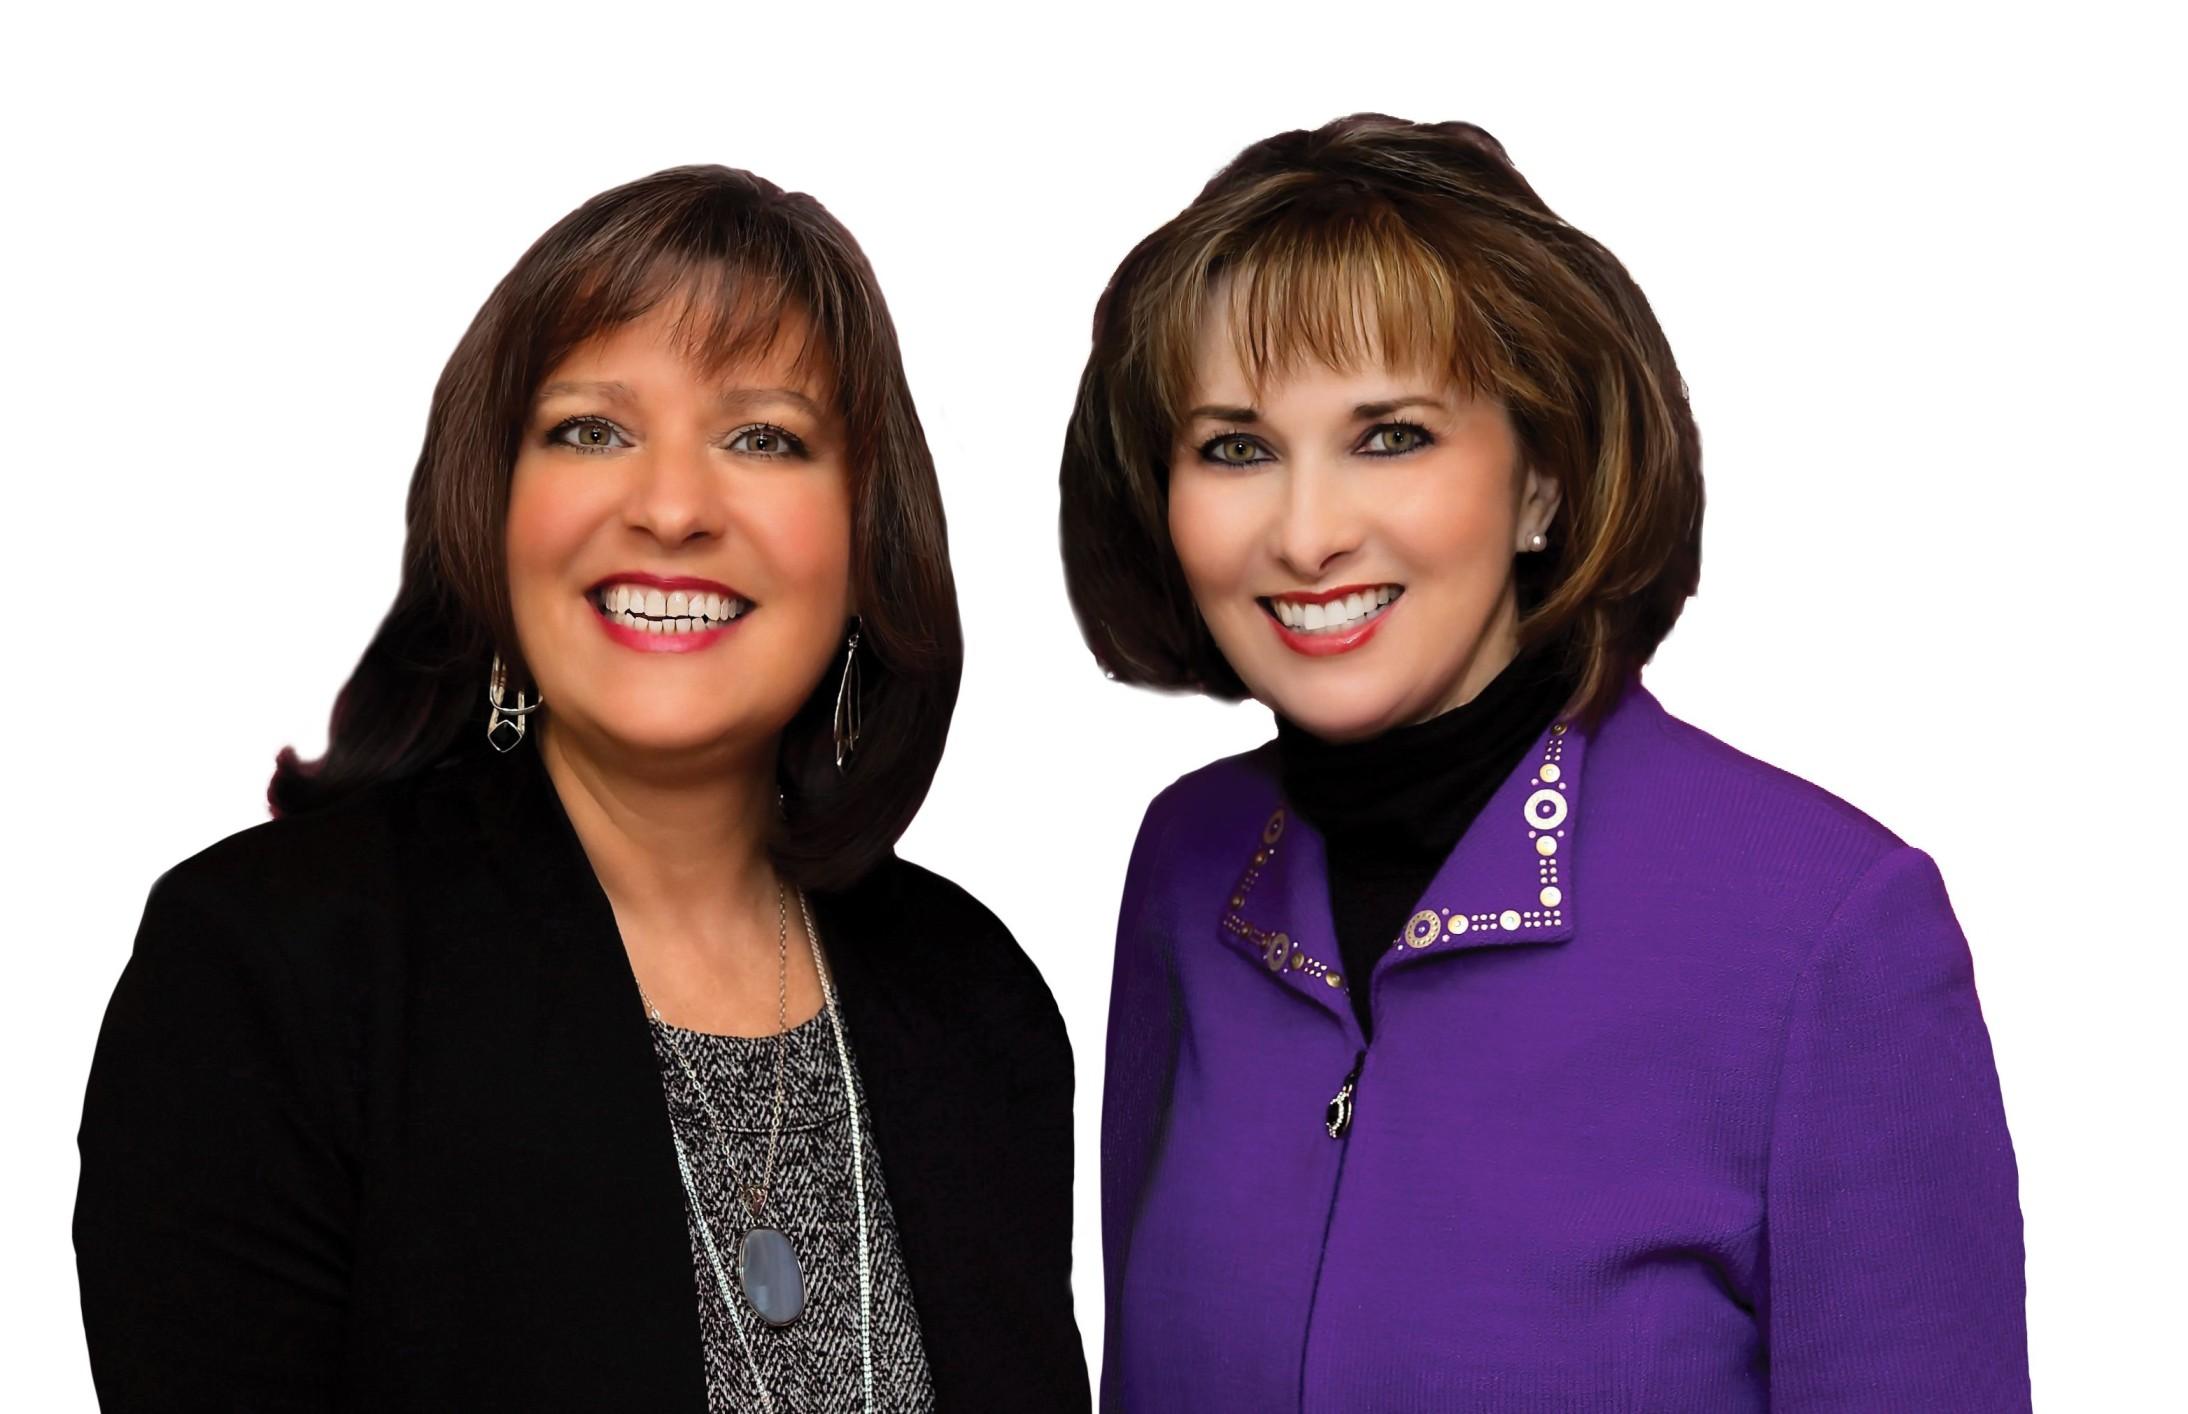 Gayla Lowke & Karen Marti Hale